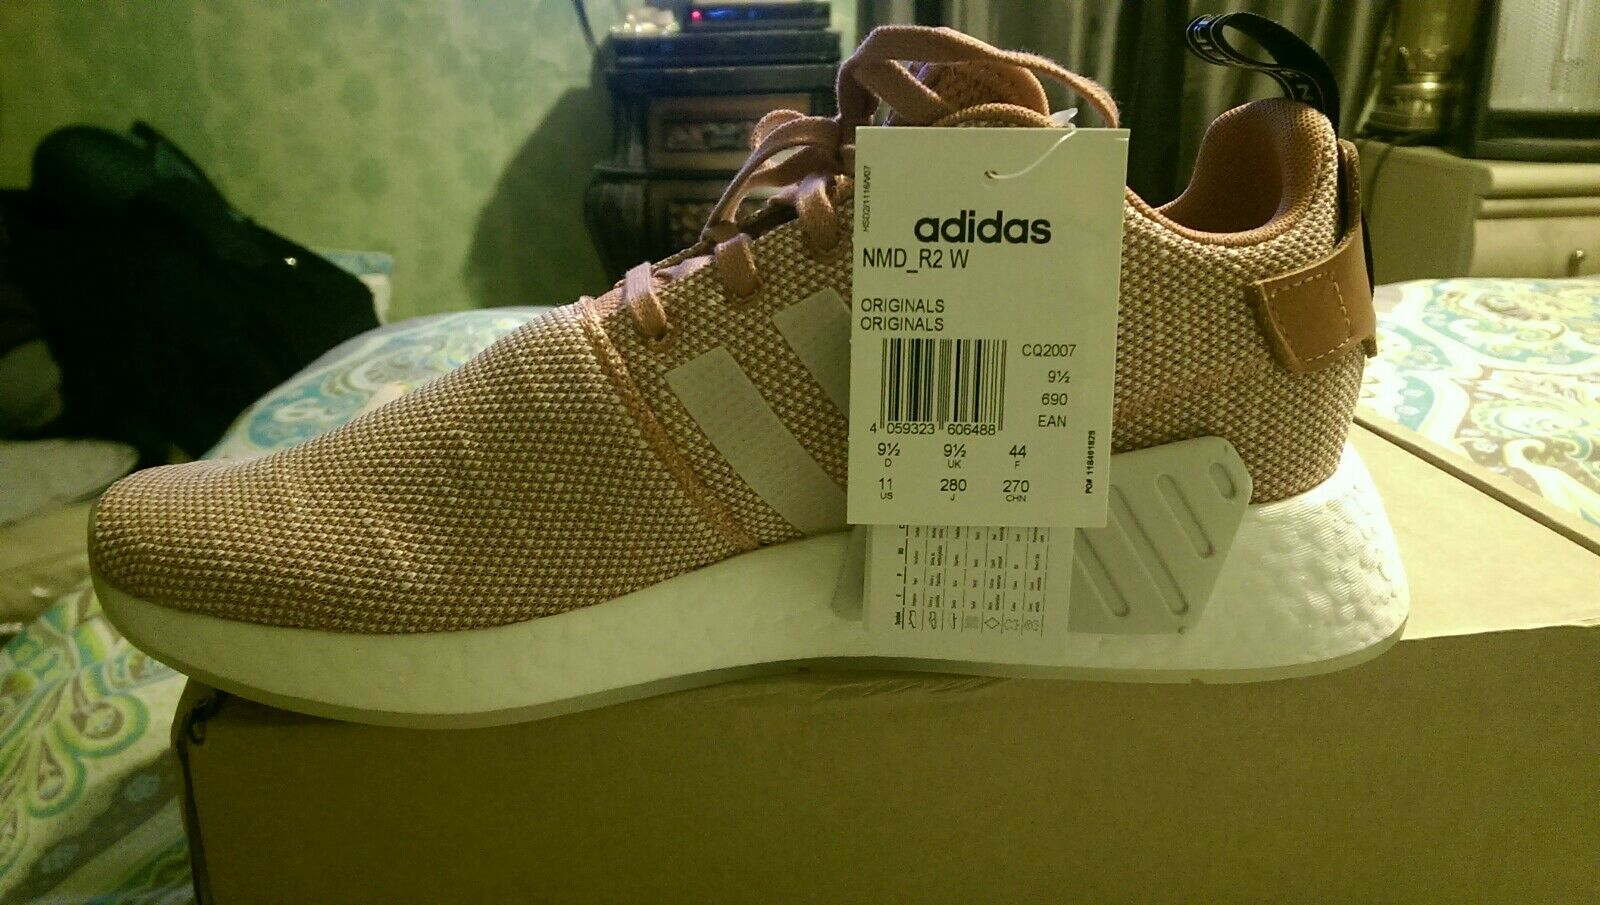 Adidas nmd r2 frauen größe 11.